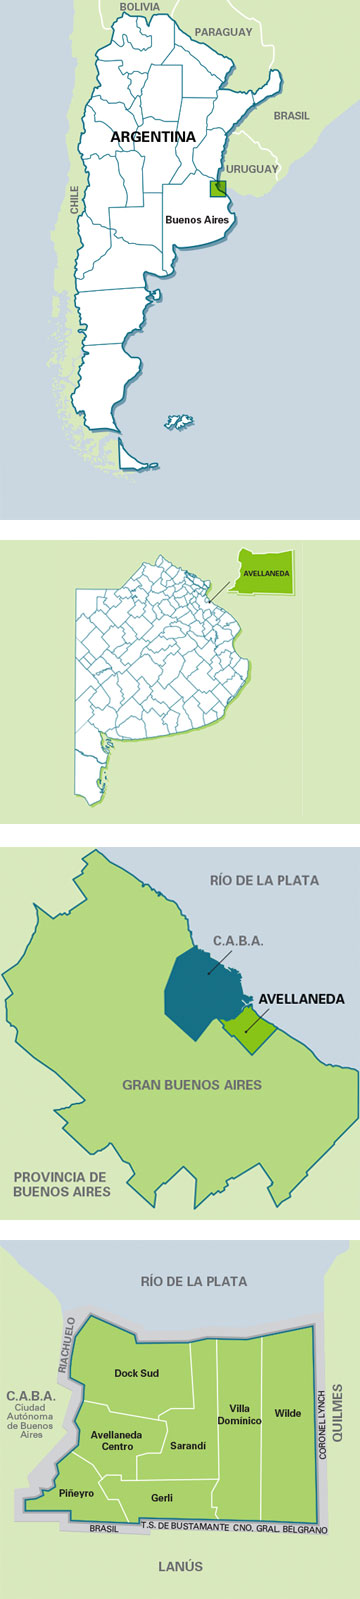 Ubicación - Avellaneda en mapas